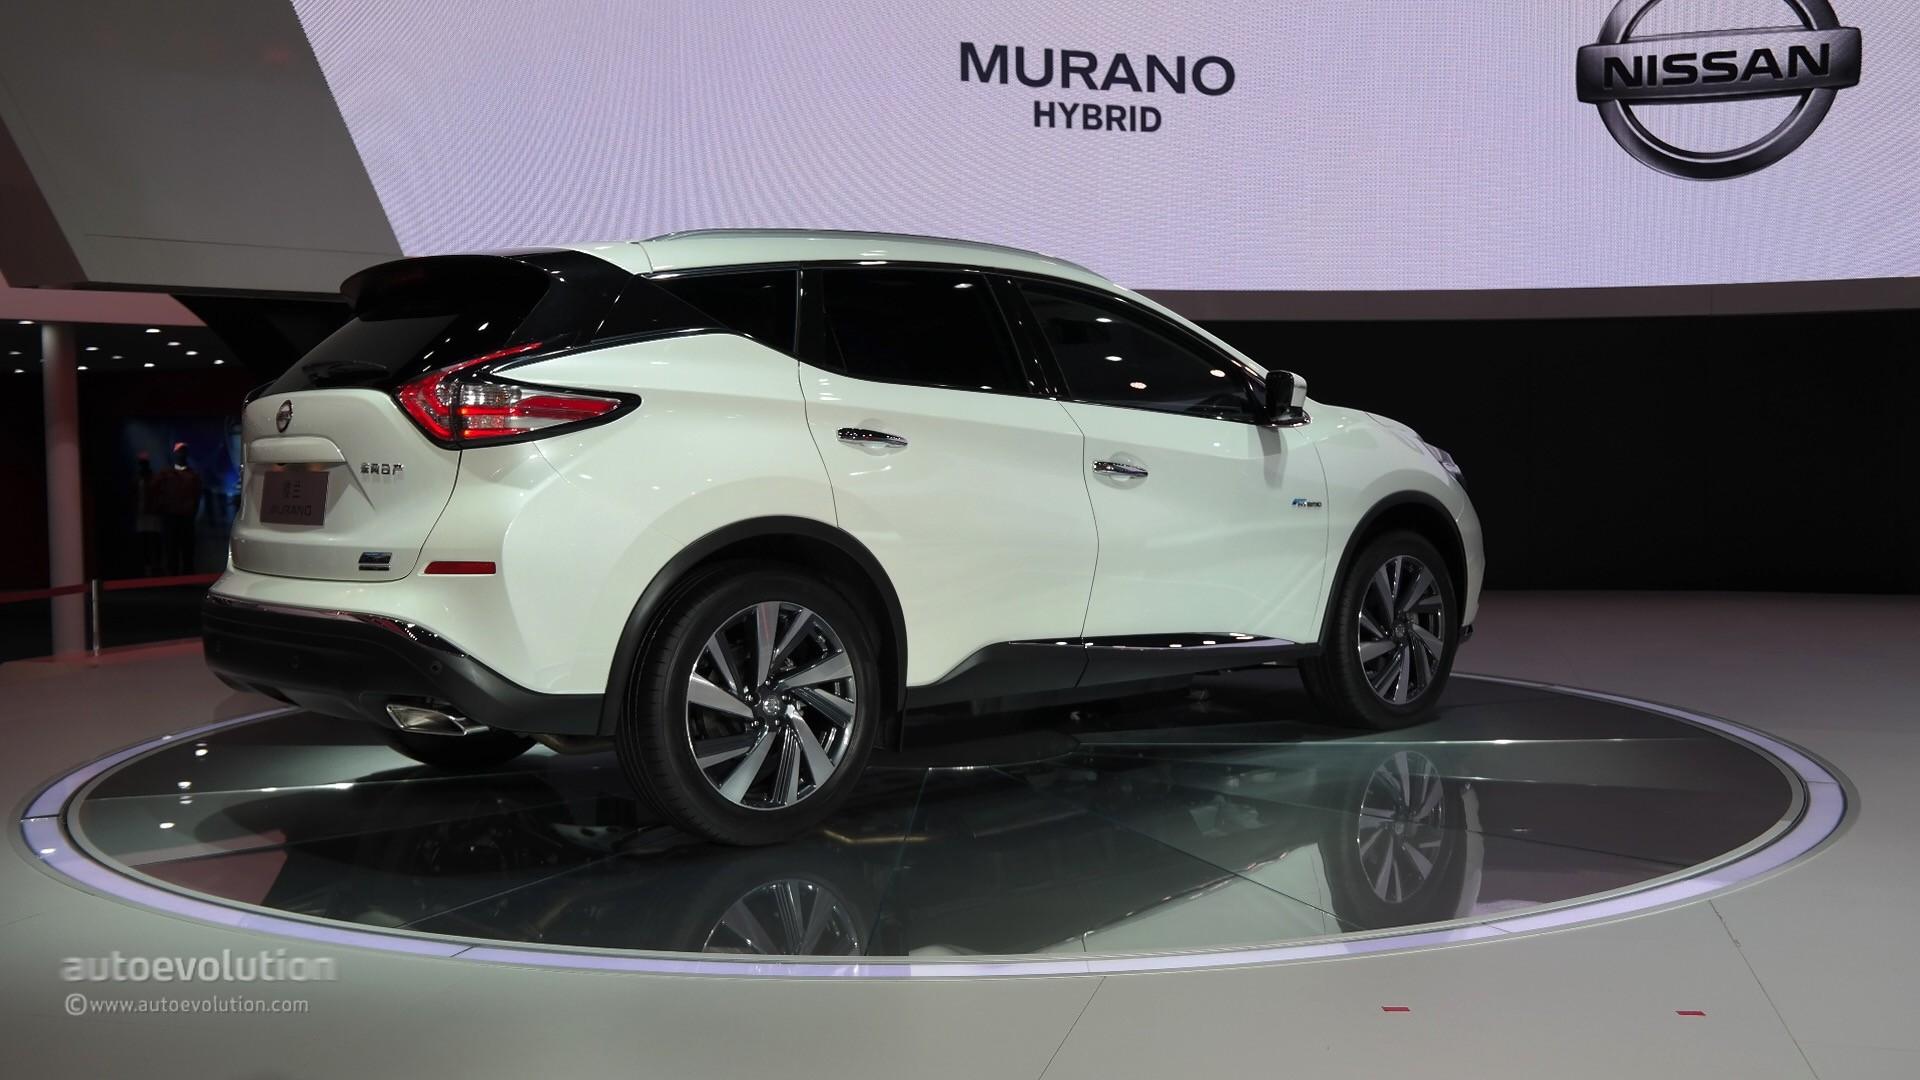 World premiere for 2016 nissan murano hybrid at auto shanghai 2015 autoevolution